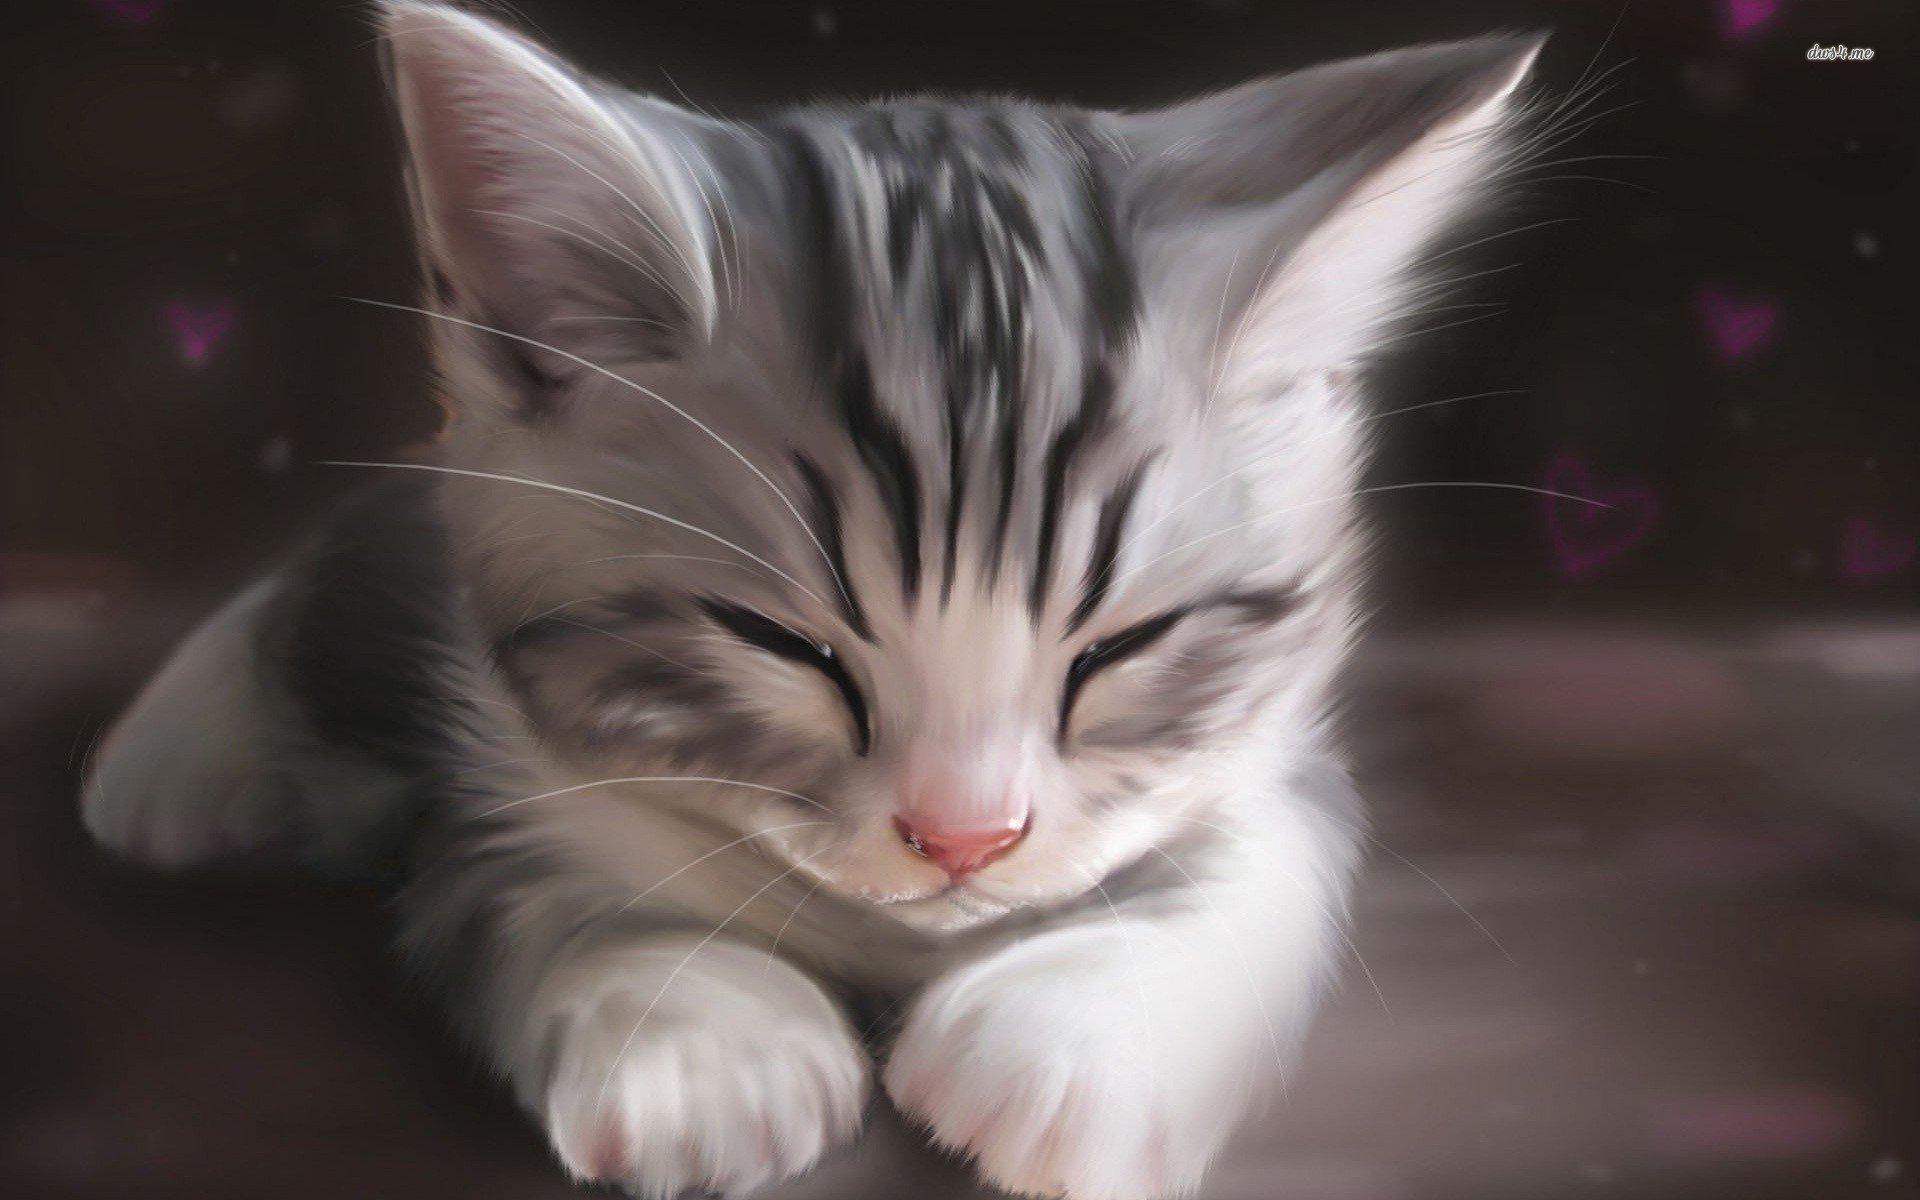 Cute anime kitty wallpaper